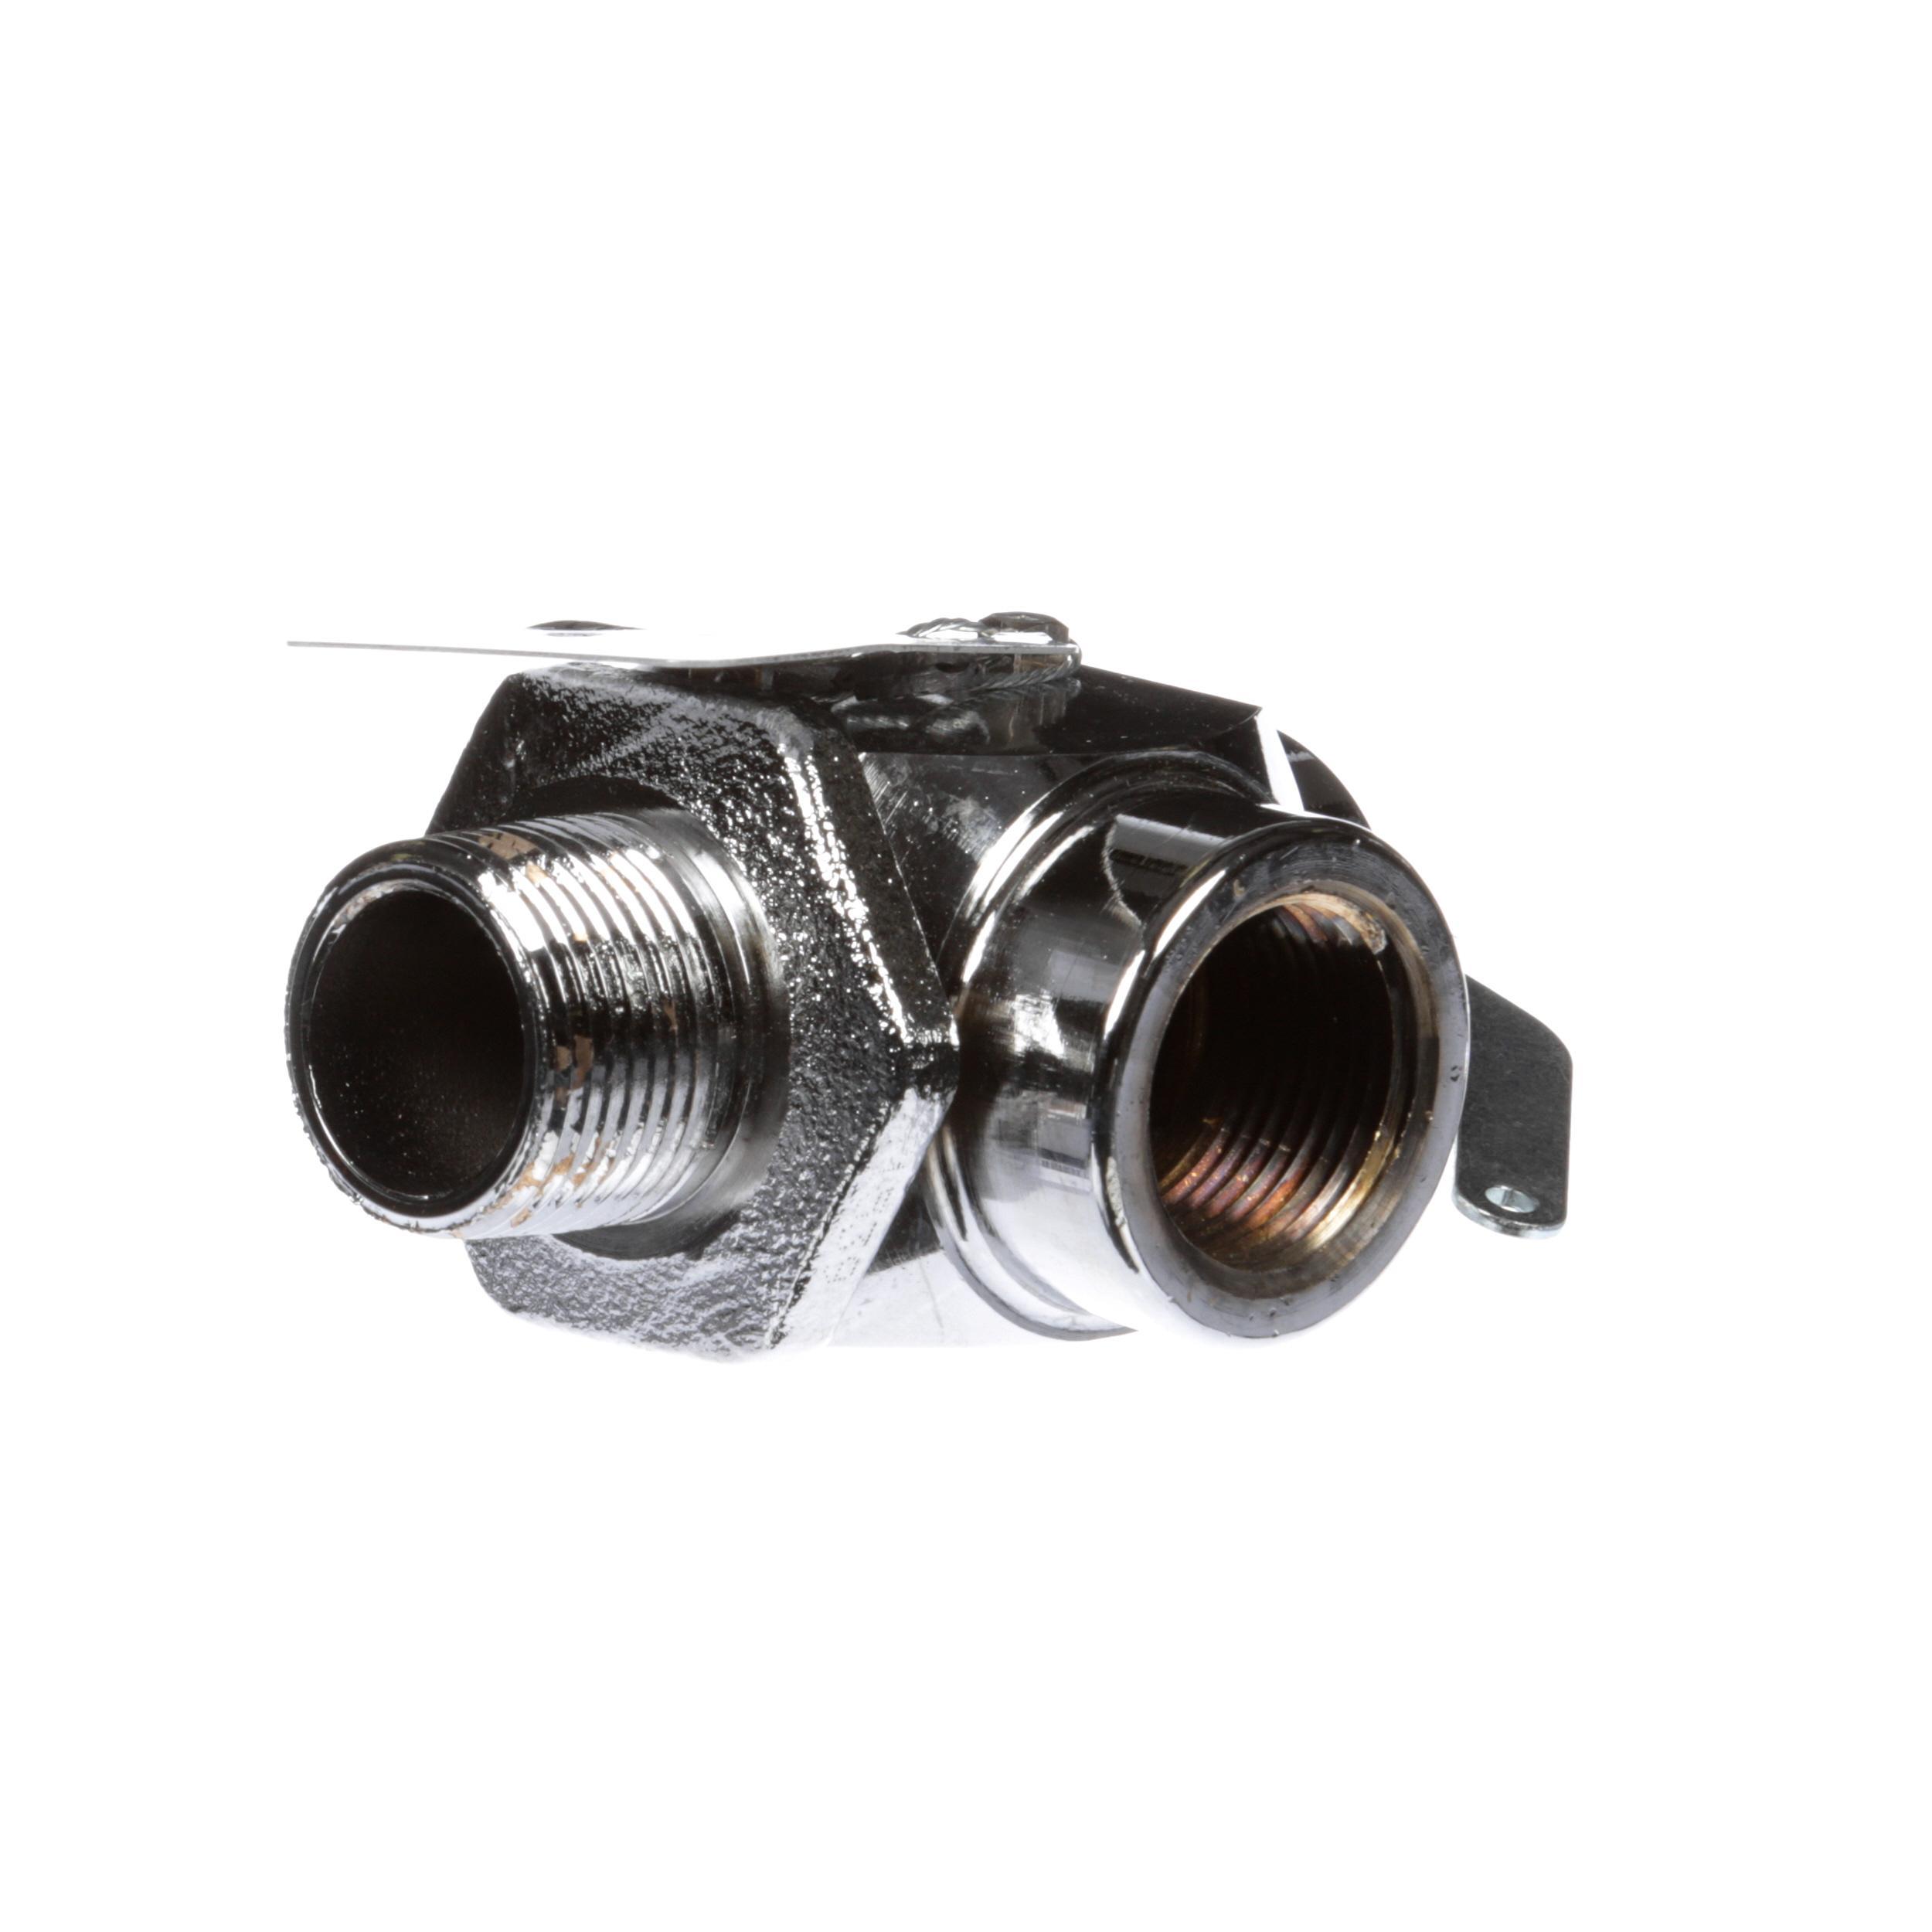 CLEVELAND SFTY VLV 50 3/4X3/4 CONBRACO 10-322-P50T